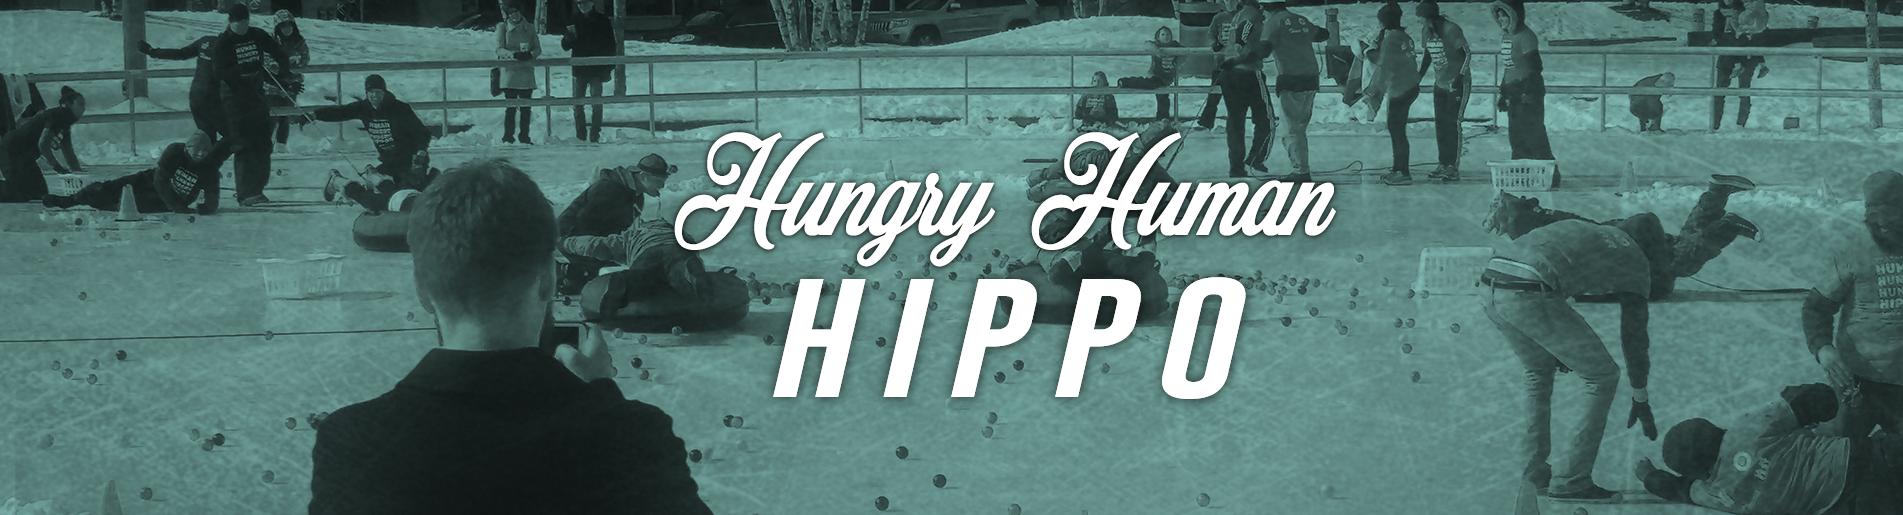 Hungry Human Hippo_WP Slider